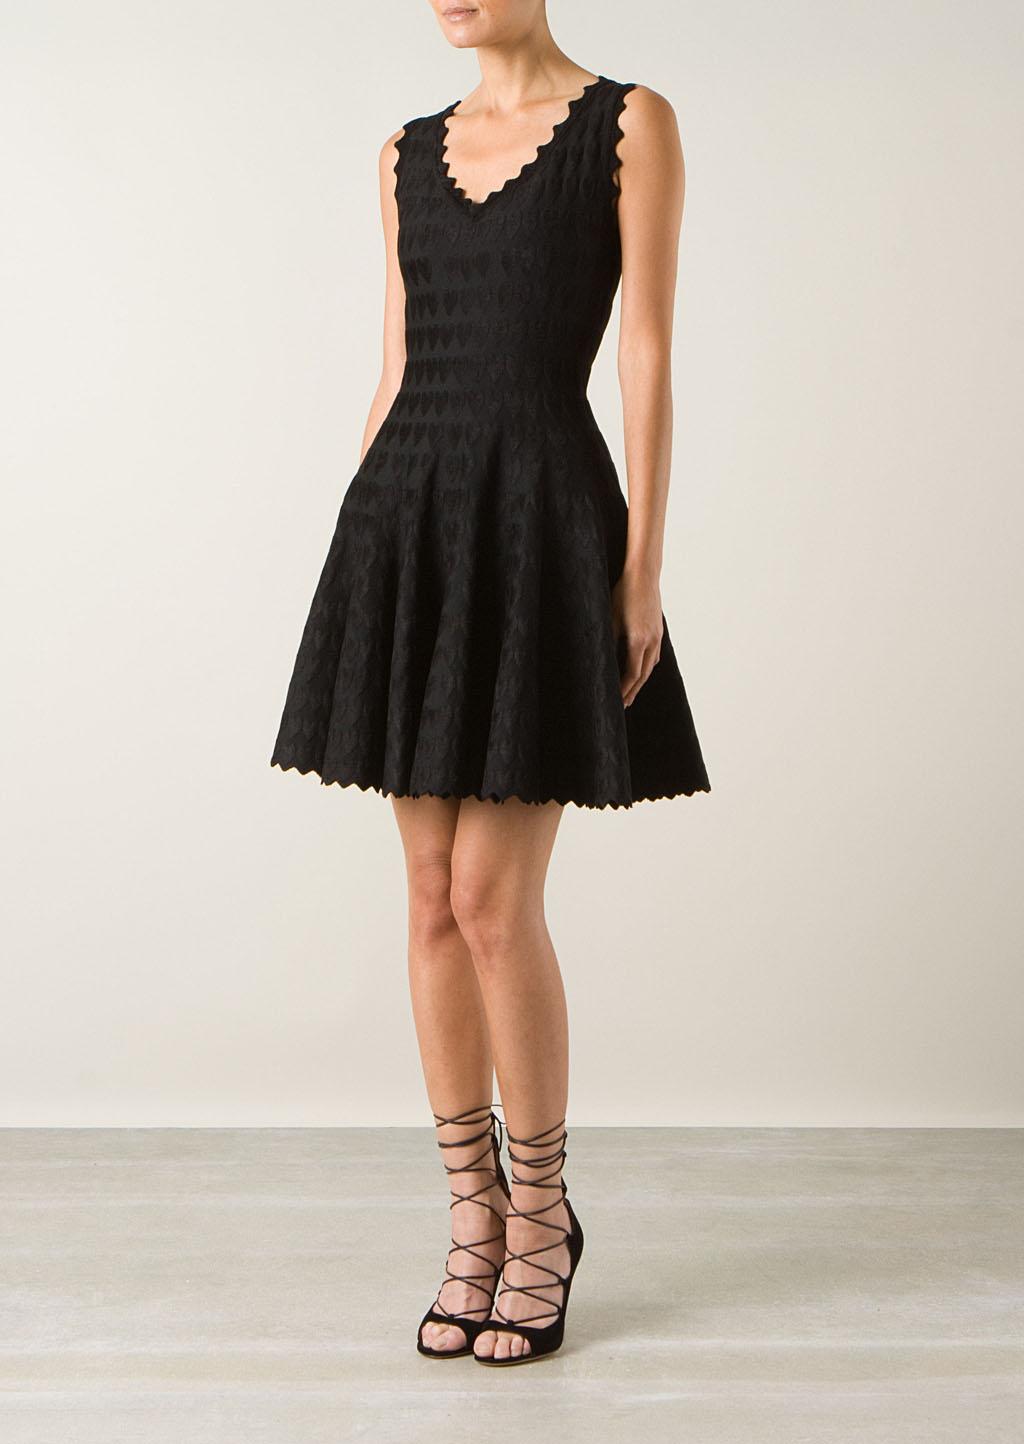 Azzedine alaïa dresses :: azzedine alaïa black fitted dress with velvet hearts